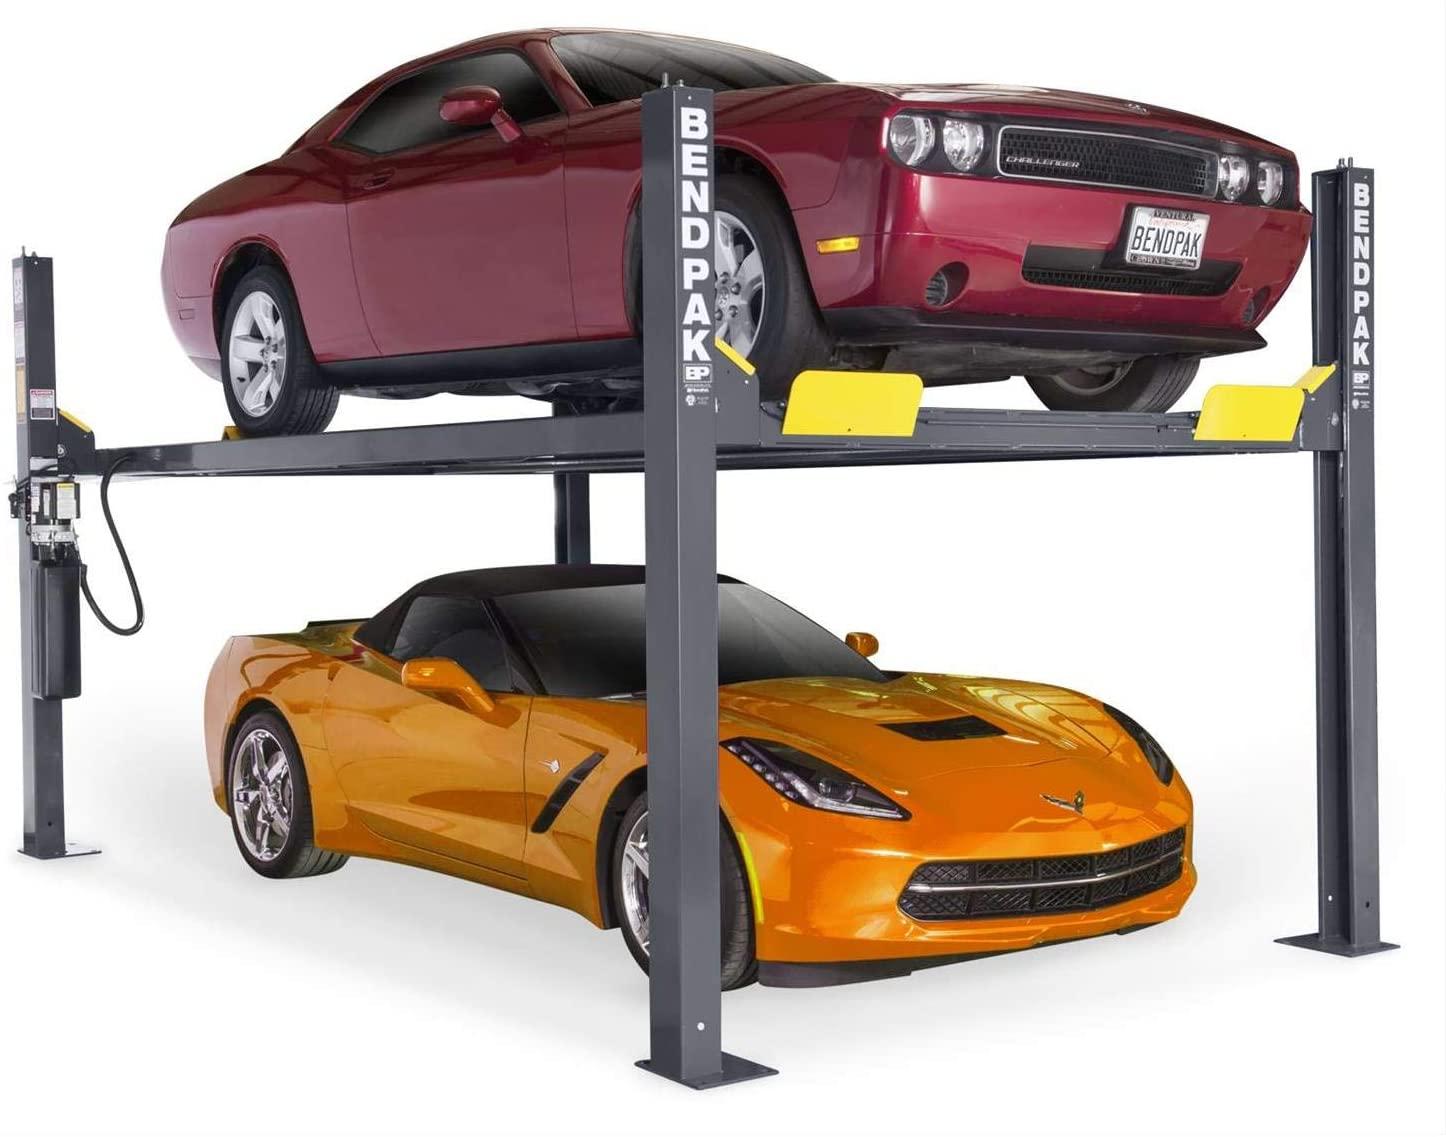 BendPak 4-Post Car Lift - 9000-Lb. Capacity, Gray Model Number HD-9